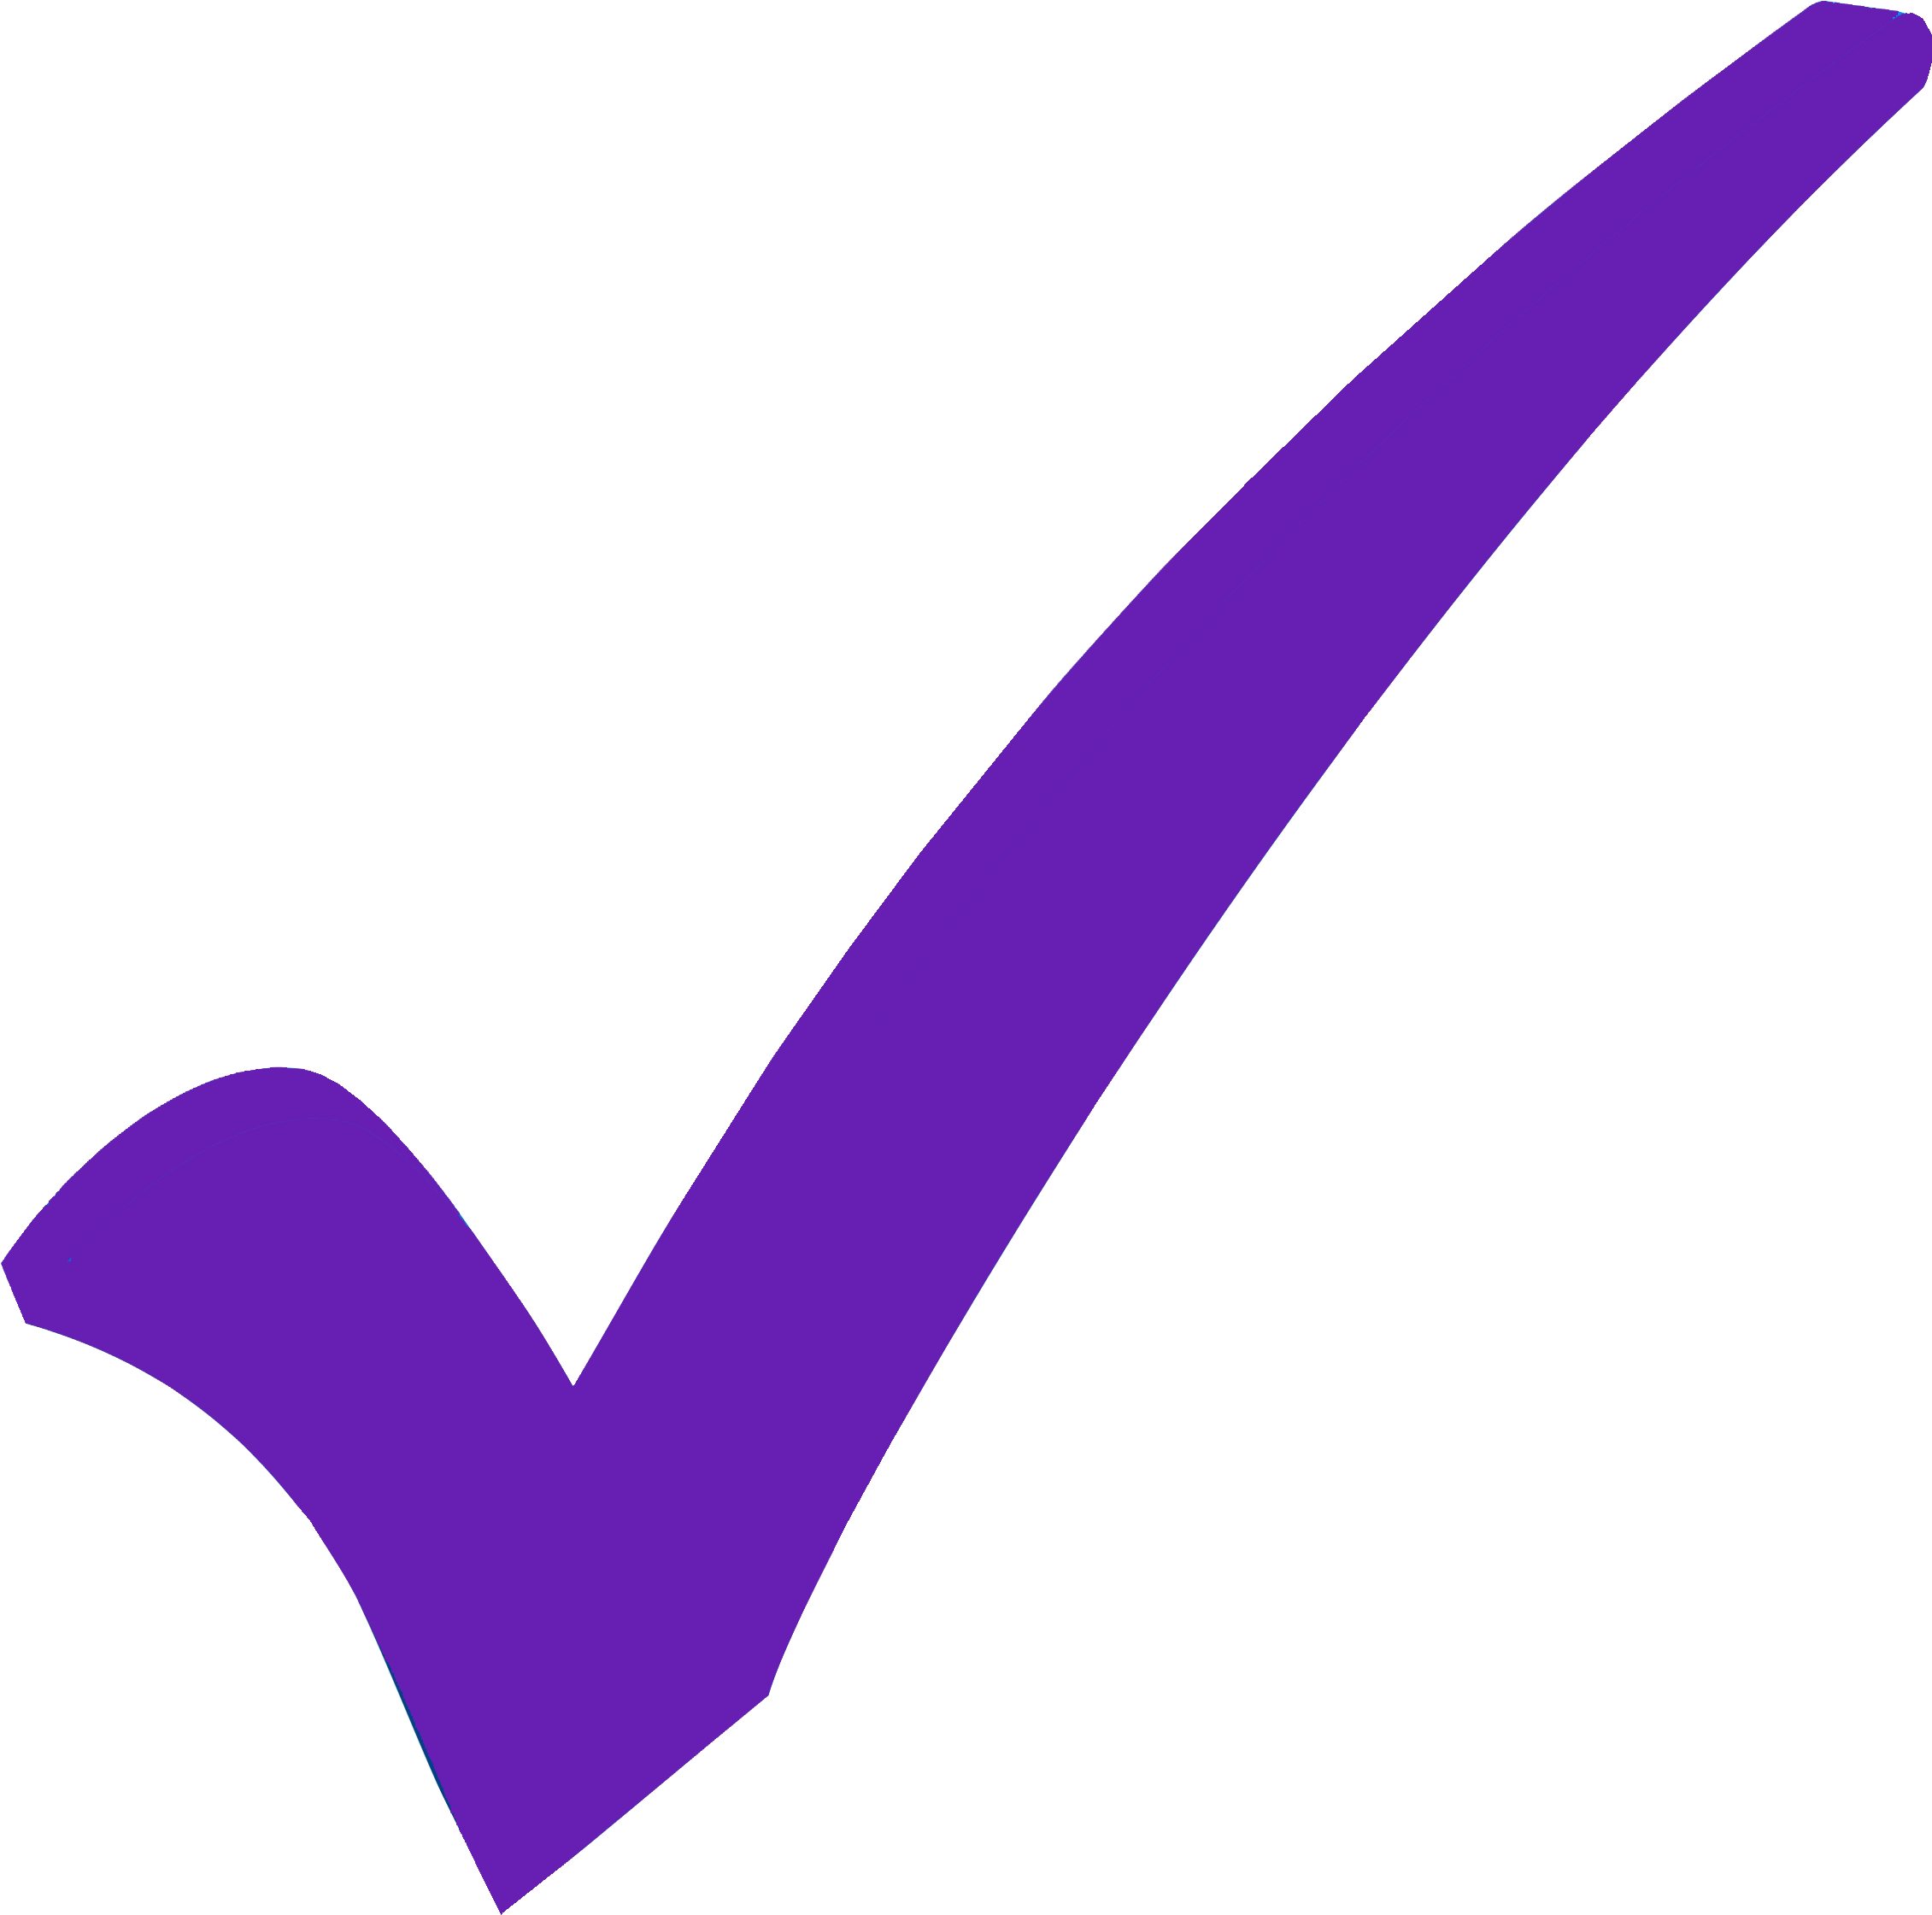 Checkmark clipart purple. Violet qigong lilac clip